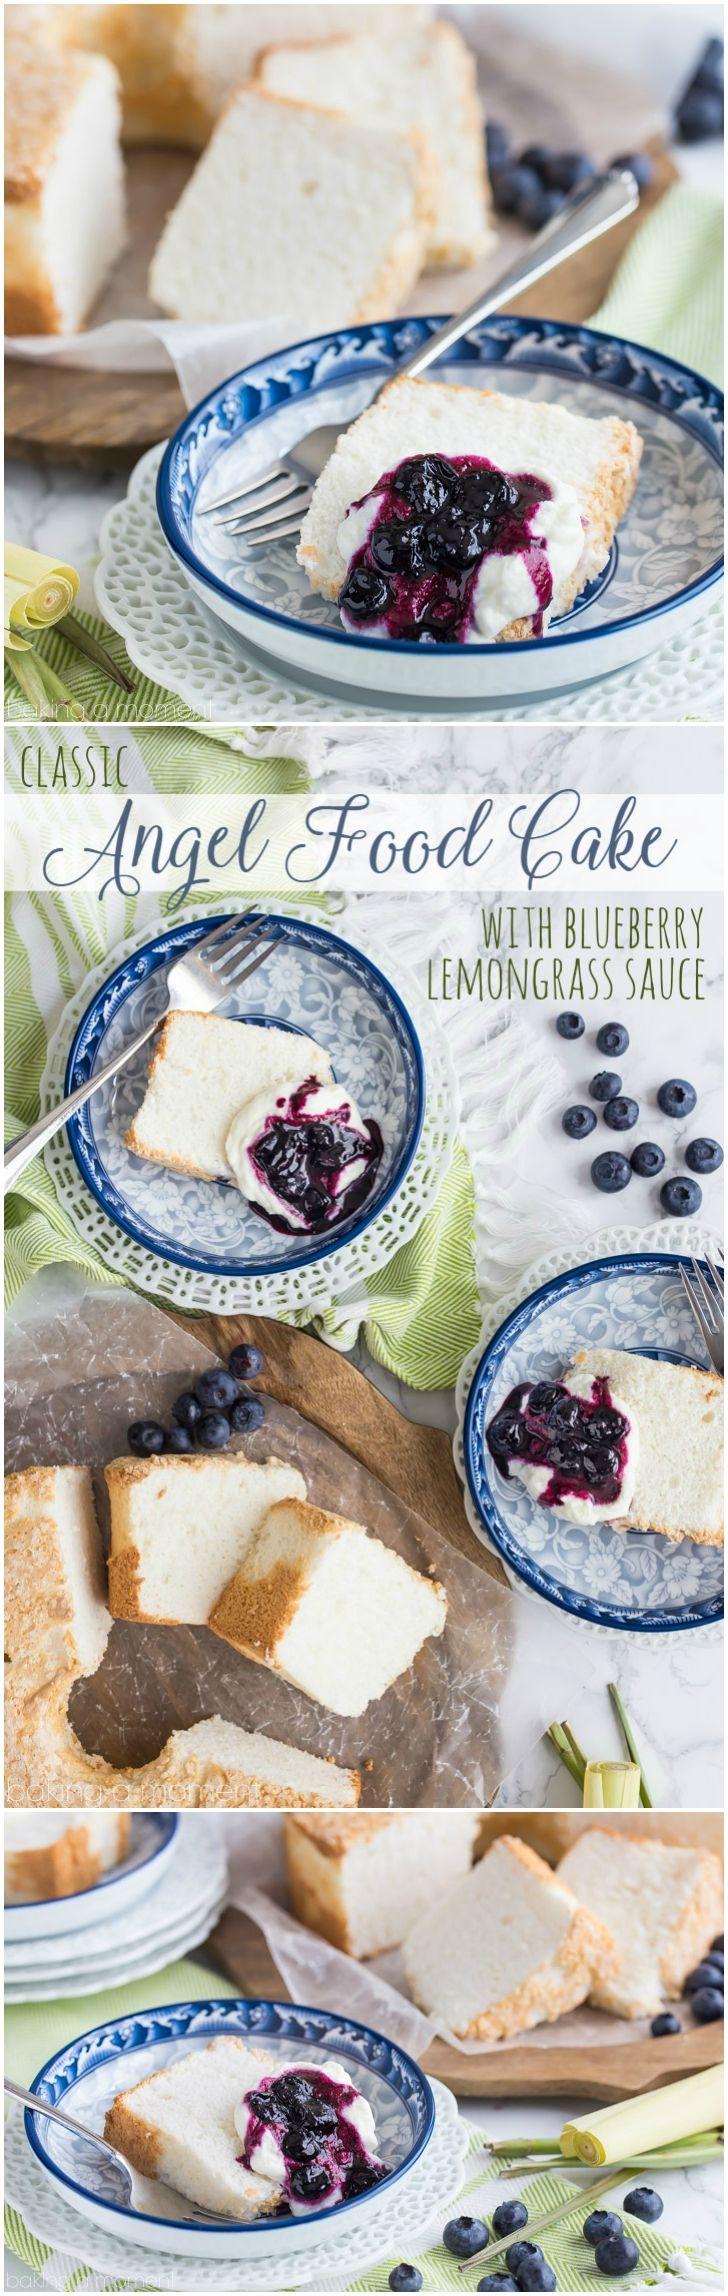 Classic Angel Food Cake: perfectly sweet